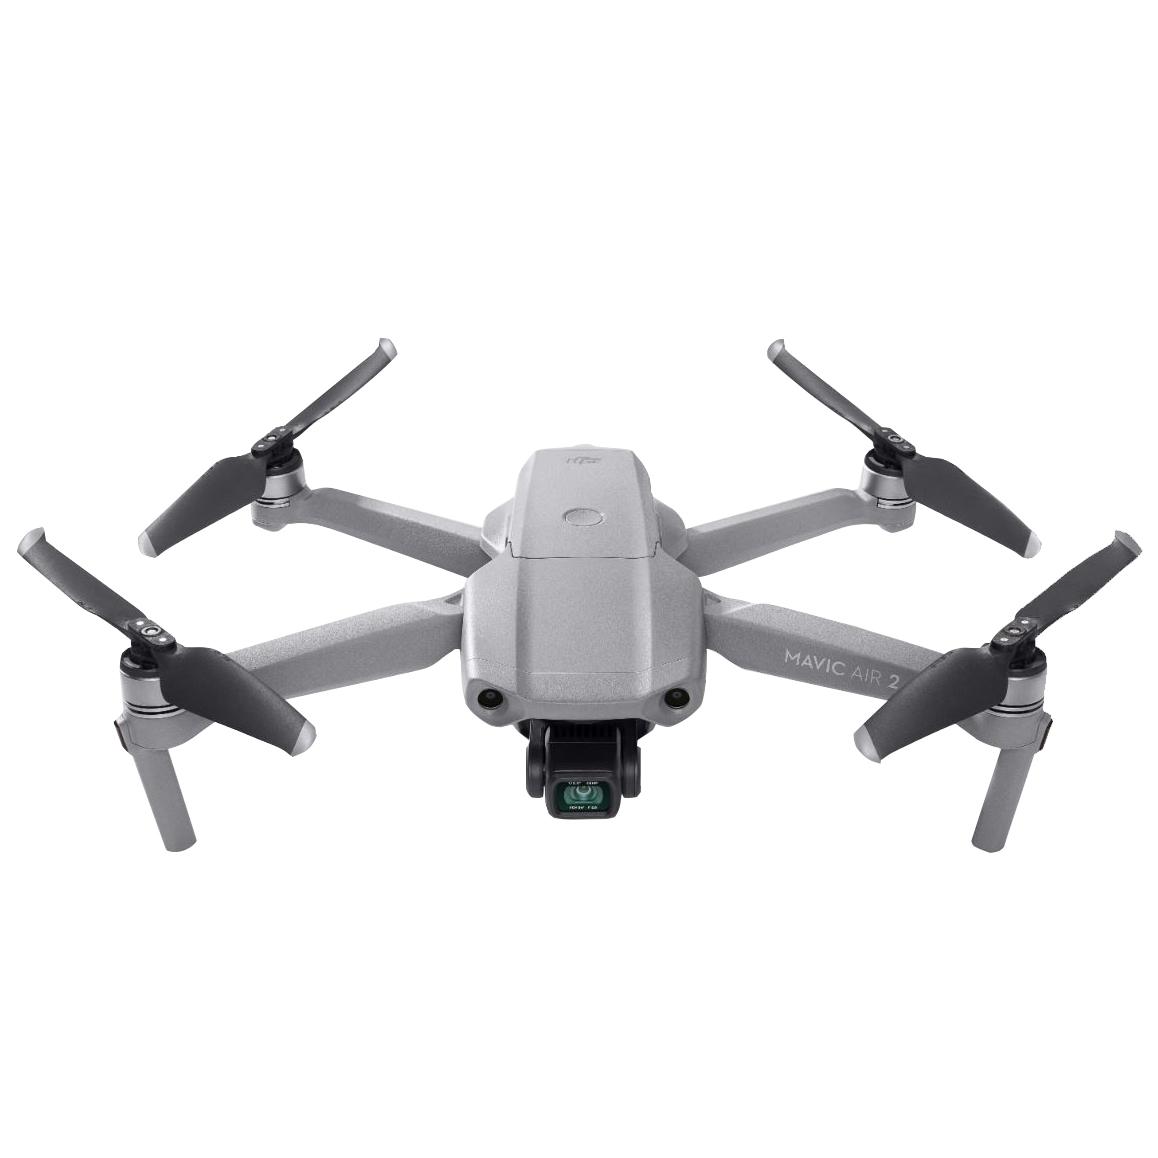 Drone MAVIC AIR 2 4K - DJI